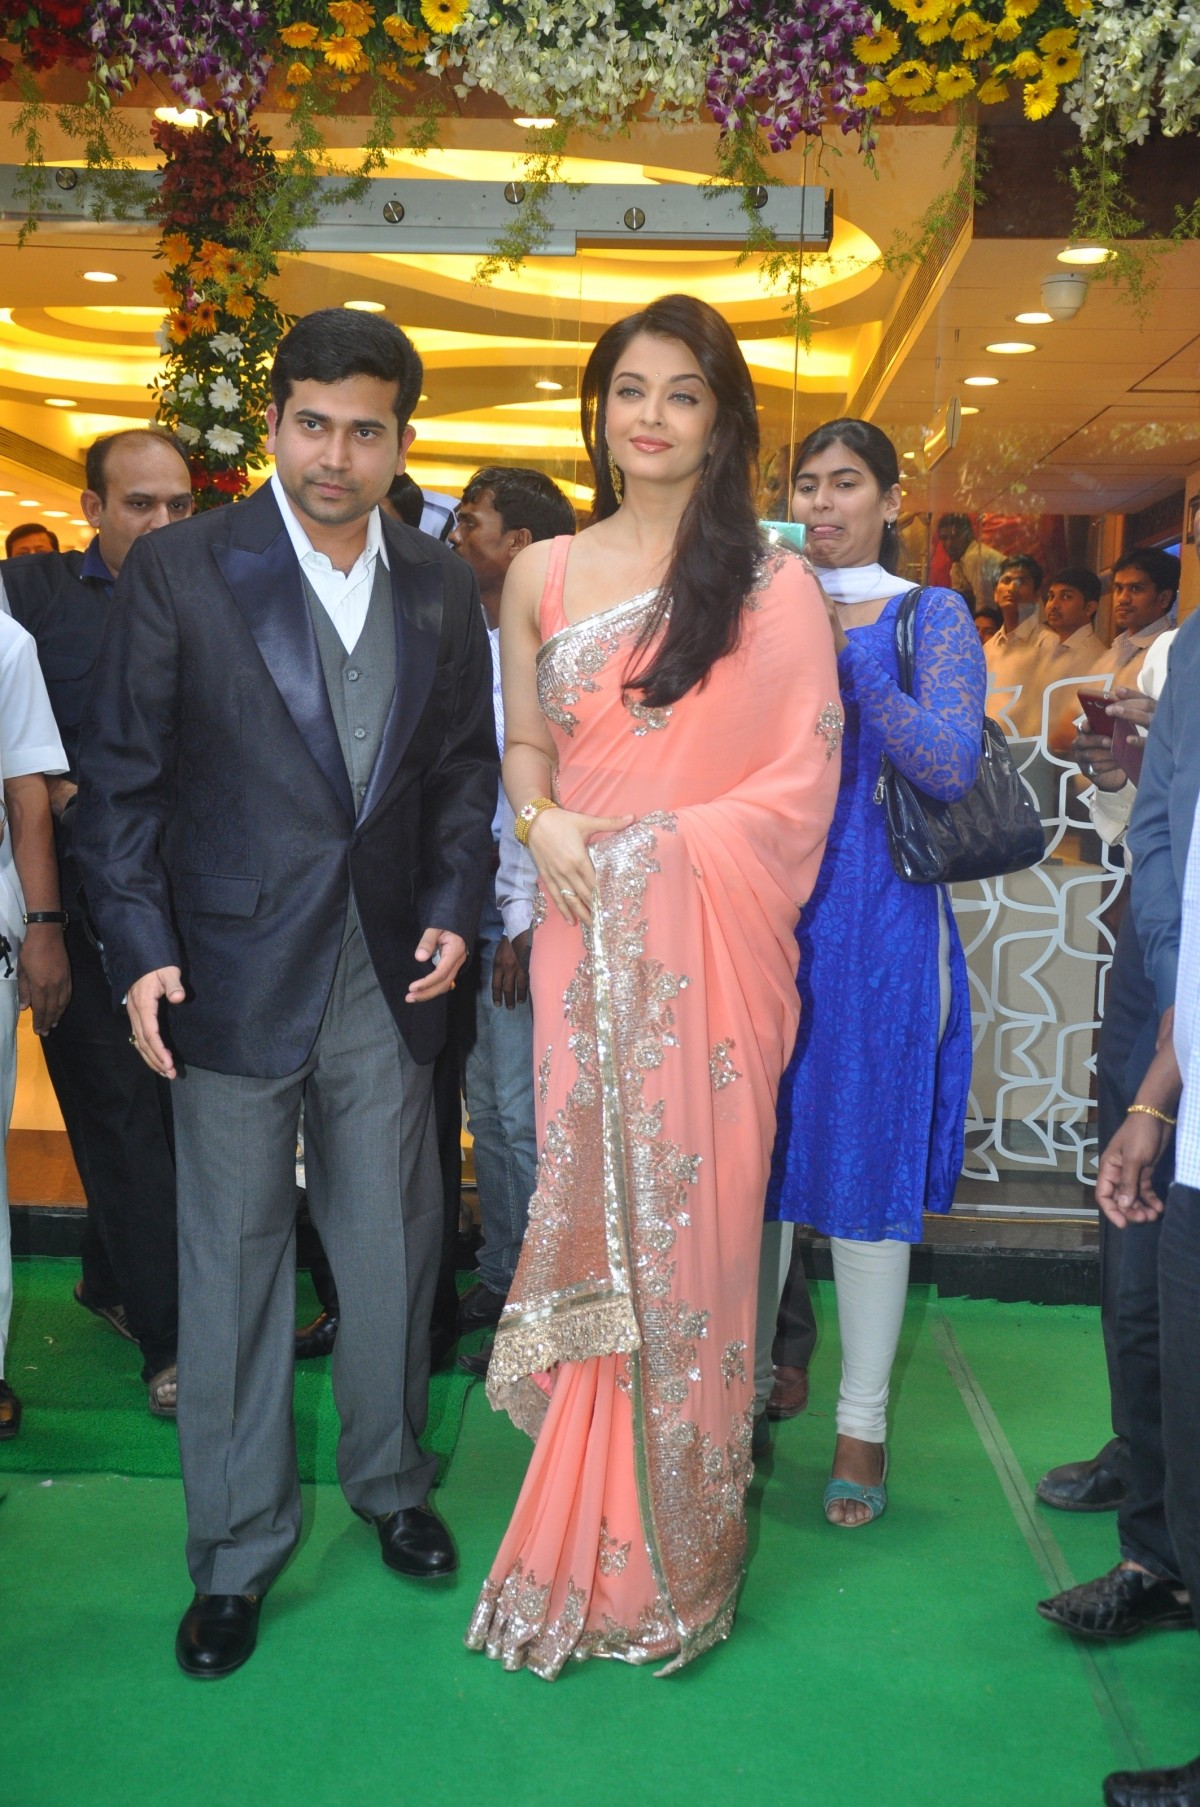 Aishwarya Rai Bachchan inaugurates Kalyan Jewellers New Store in Mumbai